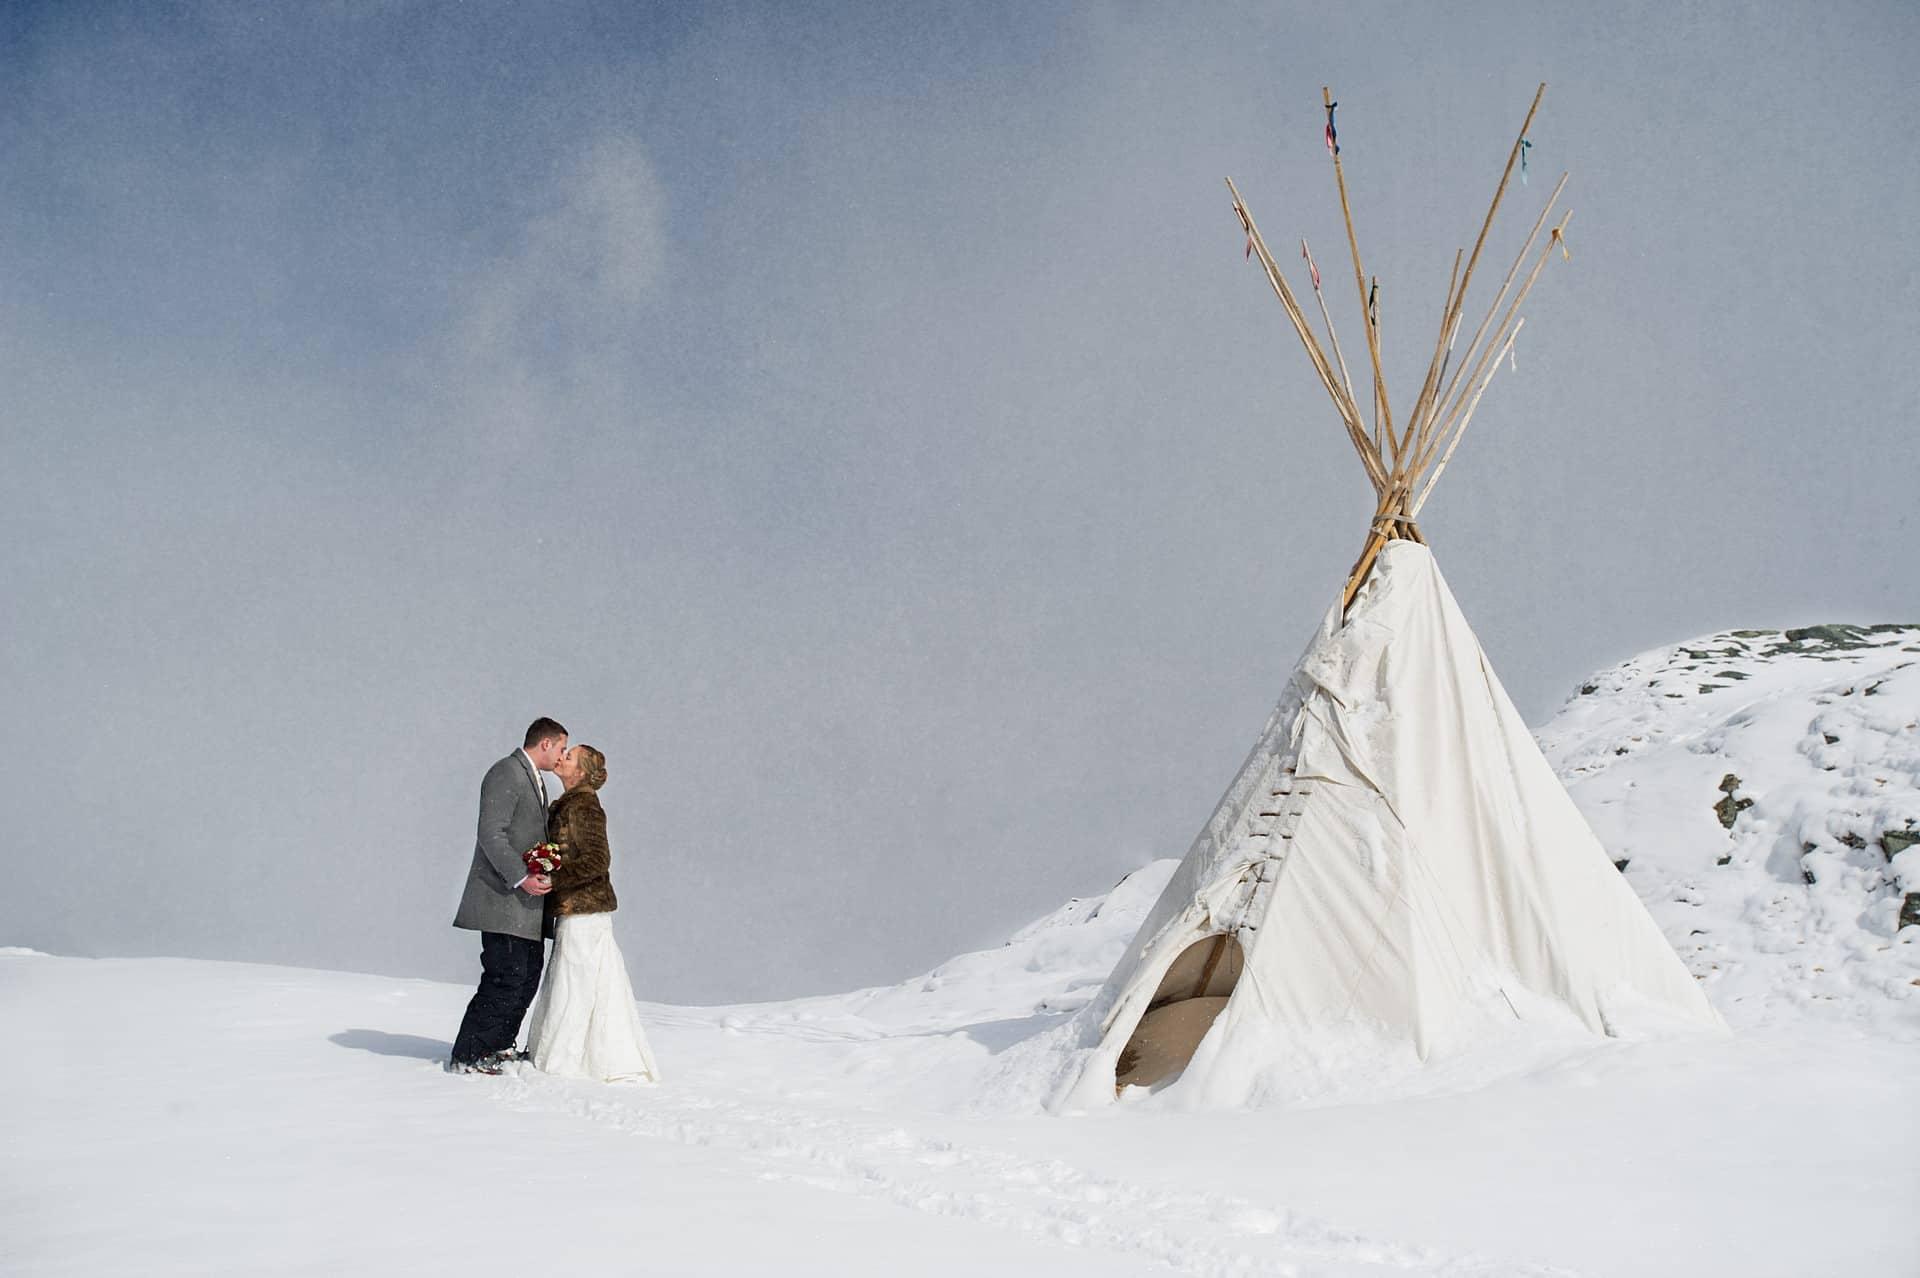 Winter wedding in zermatt 1 zermatt wedding photographer